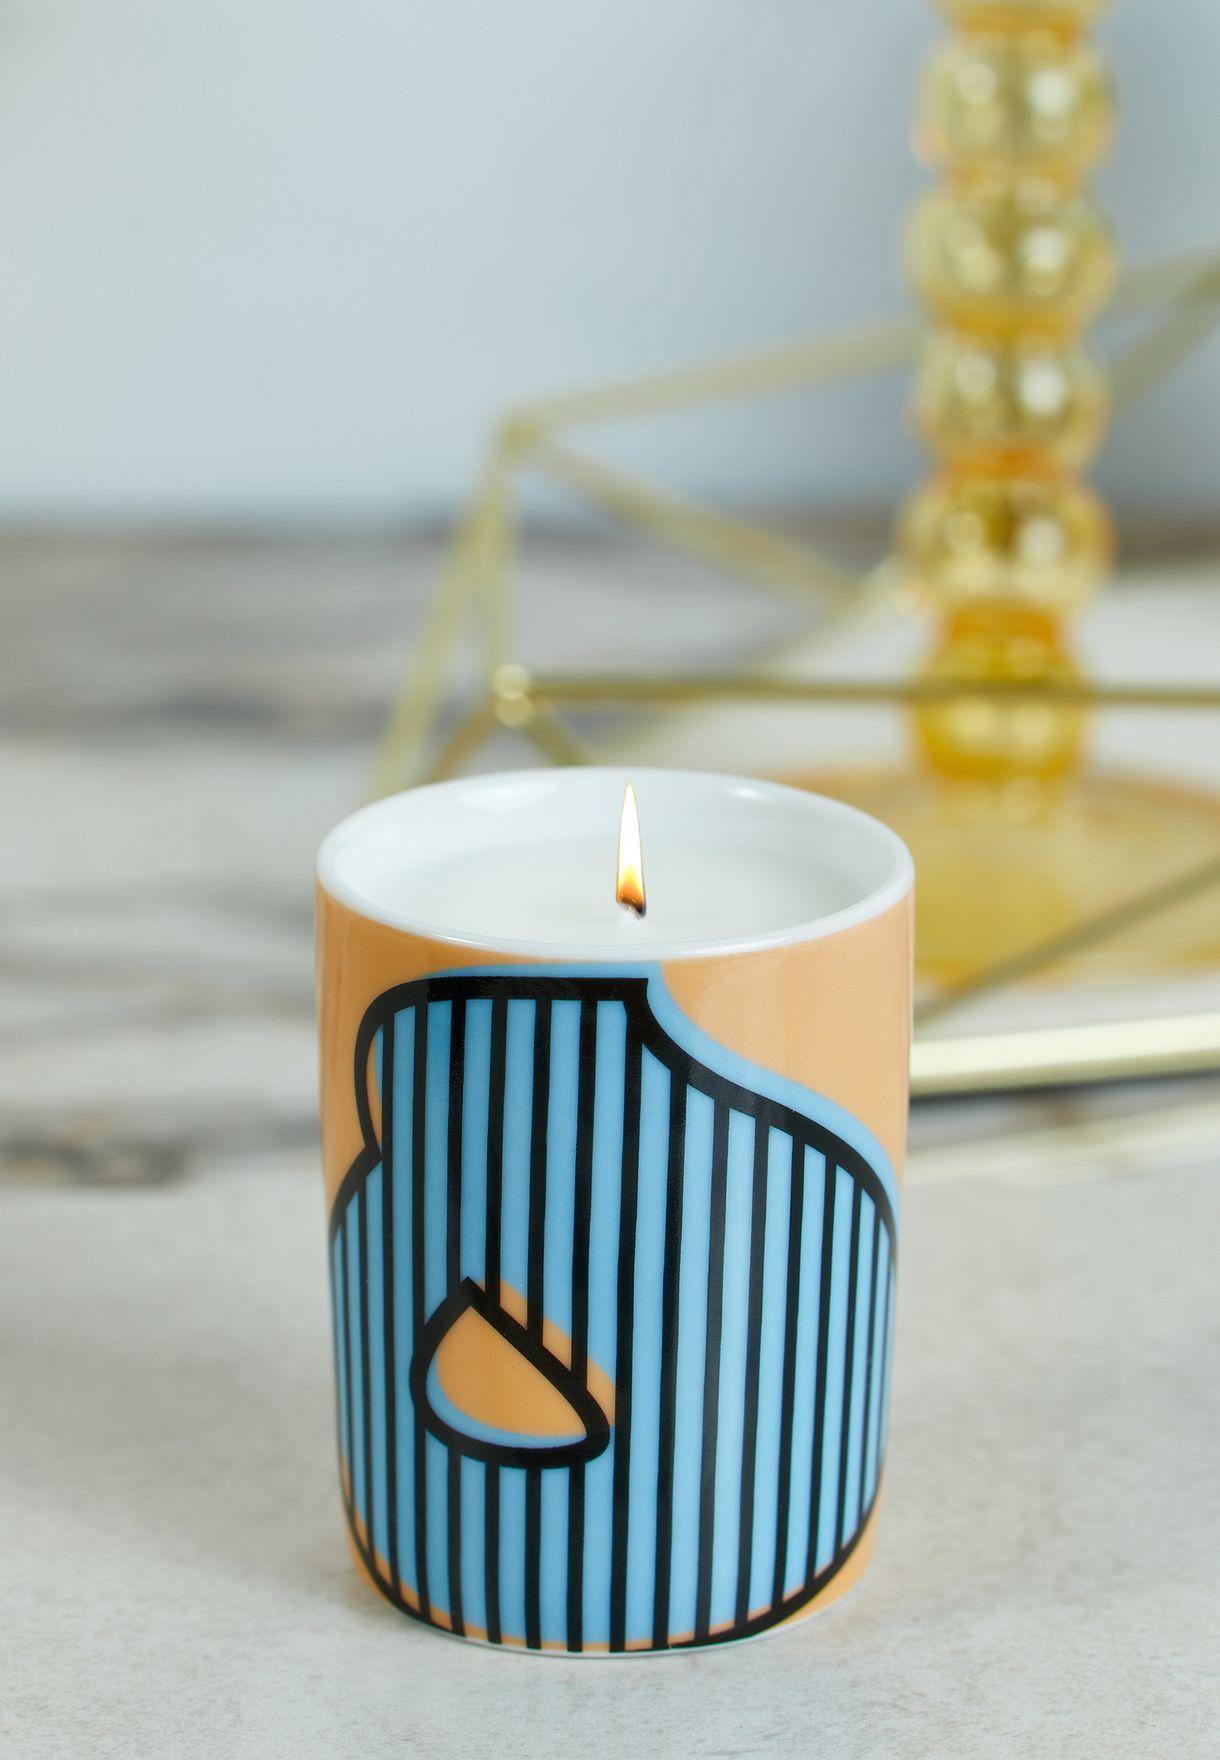 H Monogram Candle - 60g